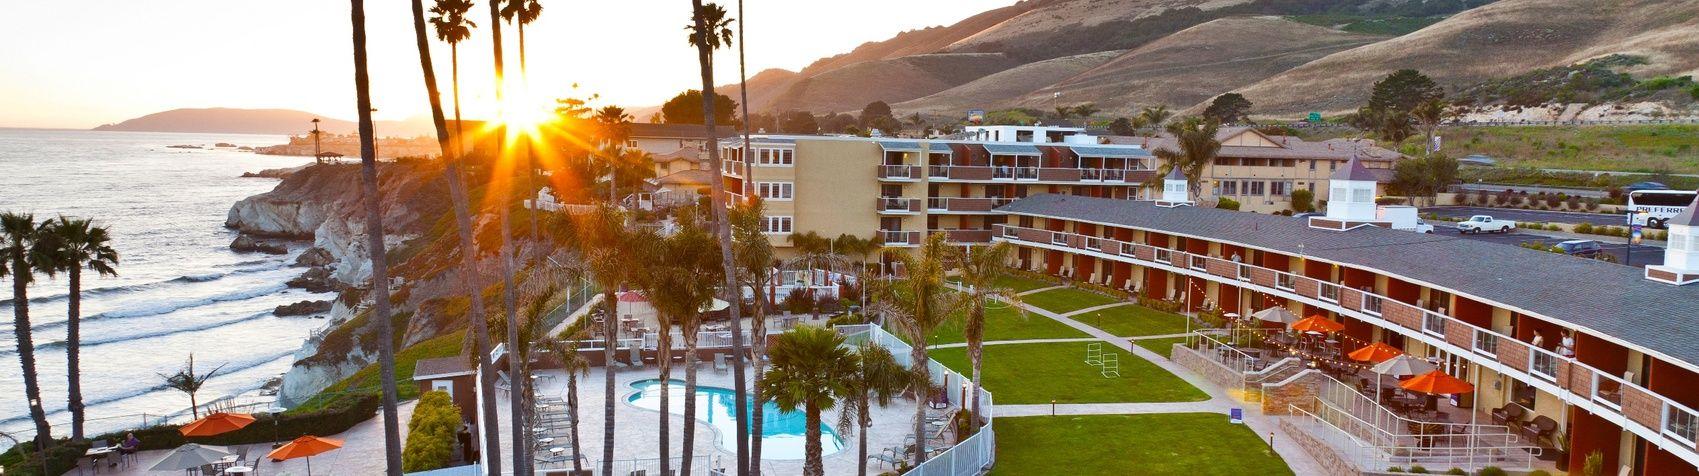 Seacrest Oceanfront Hotel Pismo Beach Ca Pet Friendly